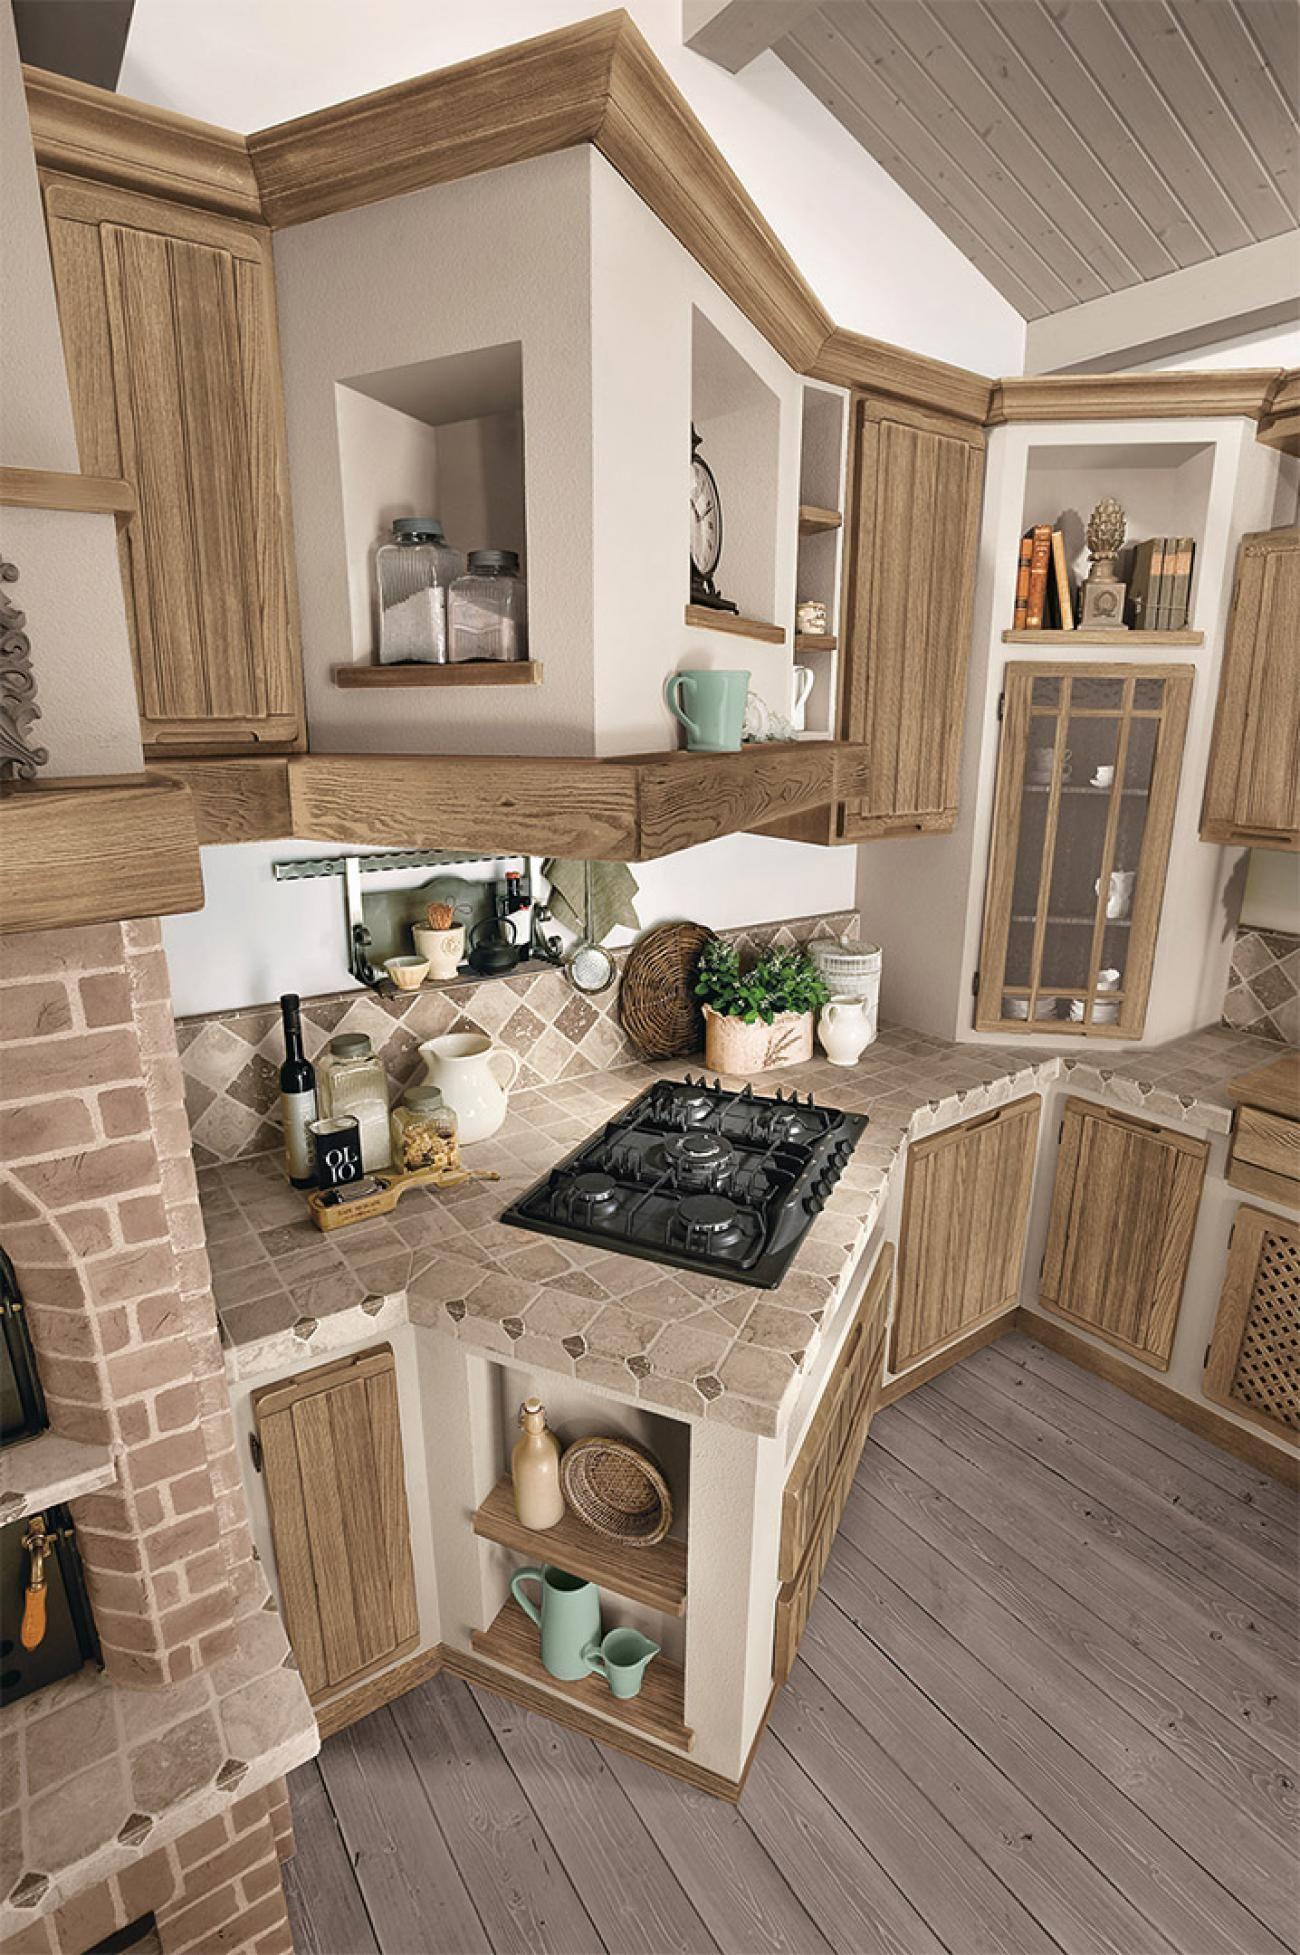 Elena Cucine Borgo Antico Cucine Lube Design Rustico Da Cucina Arredamento Cucina Vintage Arredo Interni Cucina